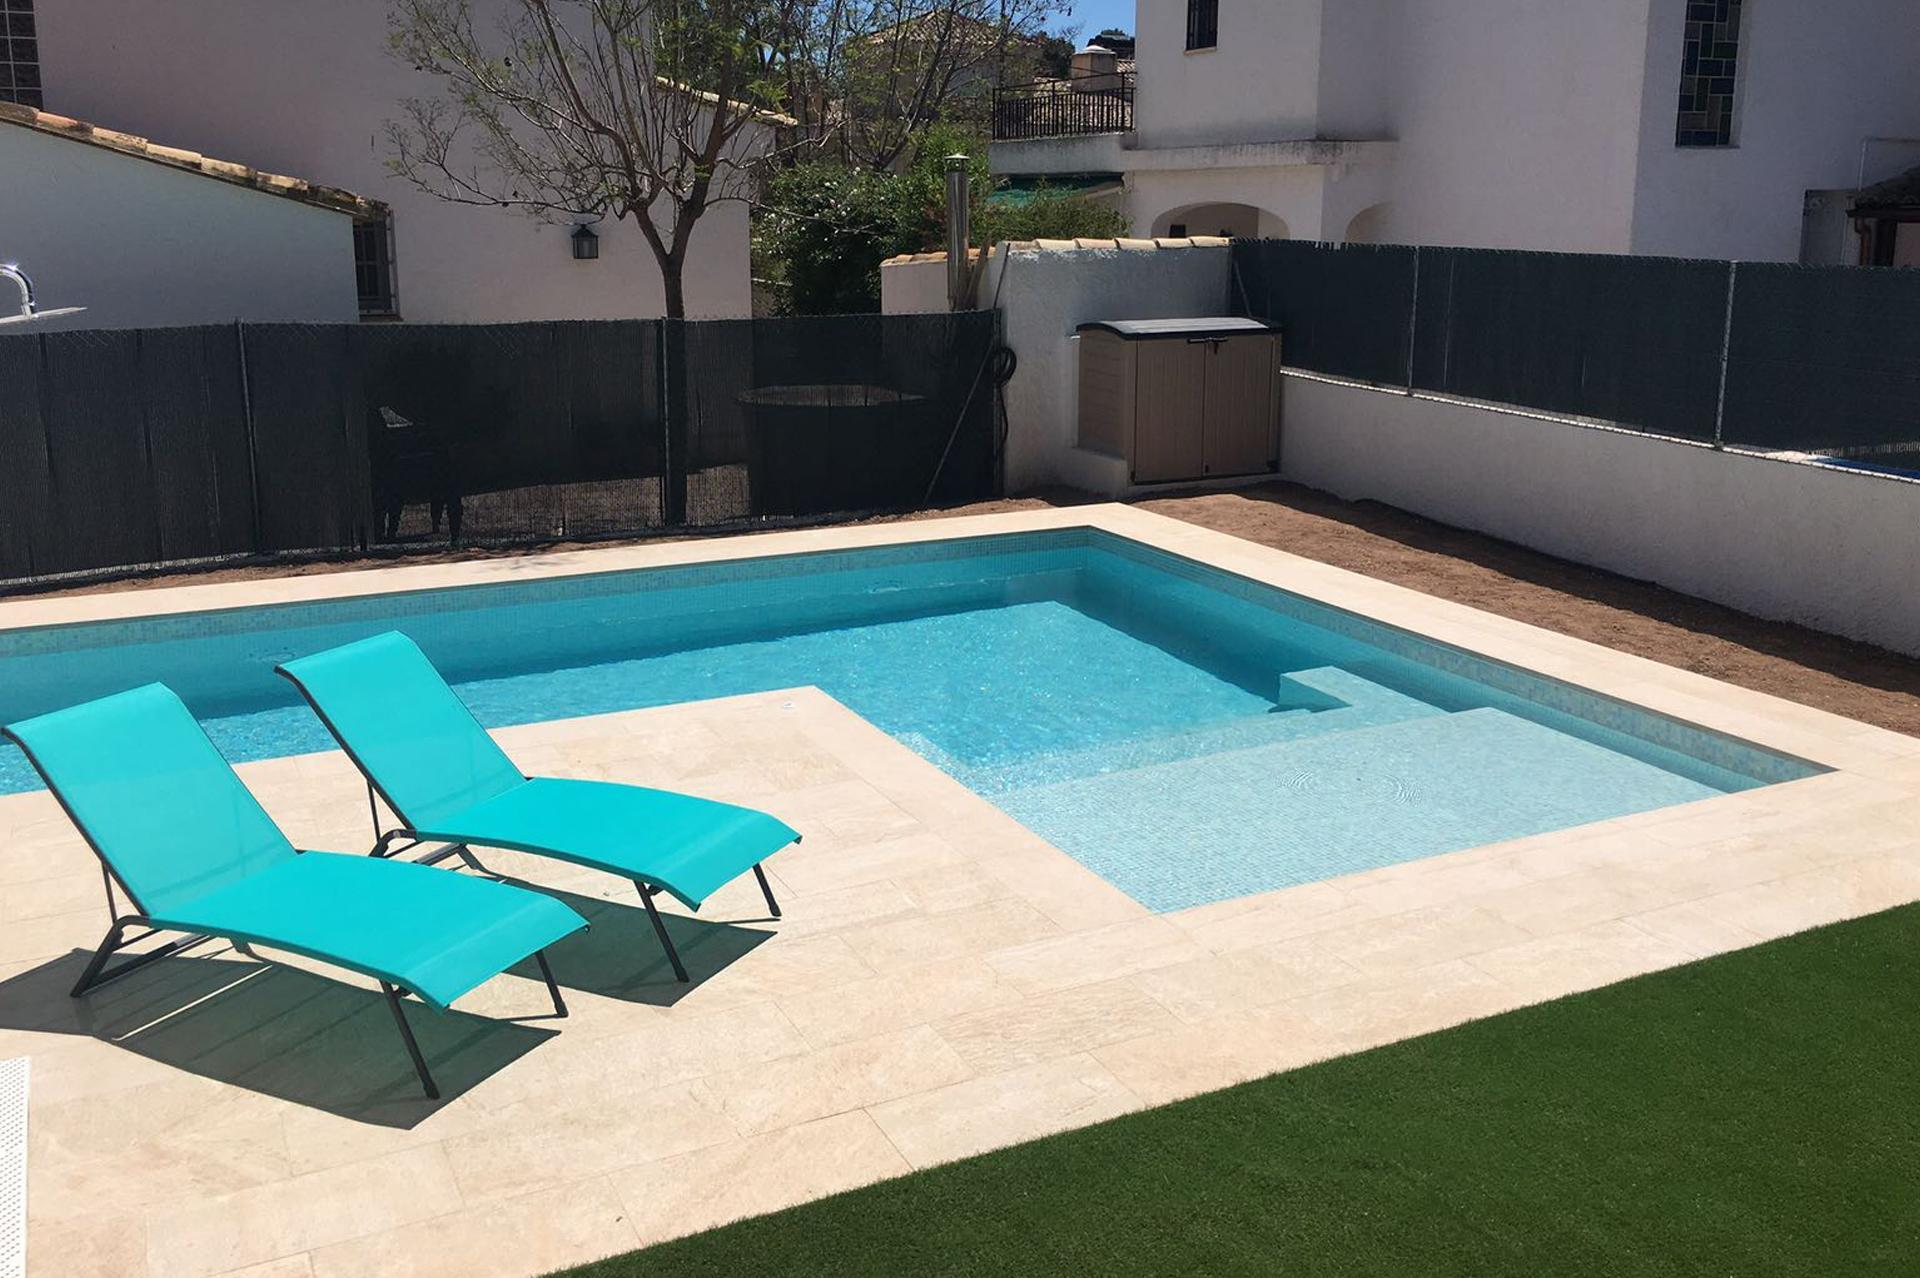 poolplay_reformas_piscinas_19